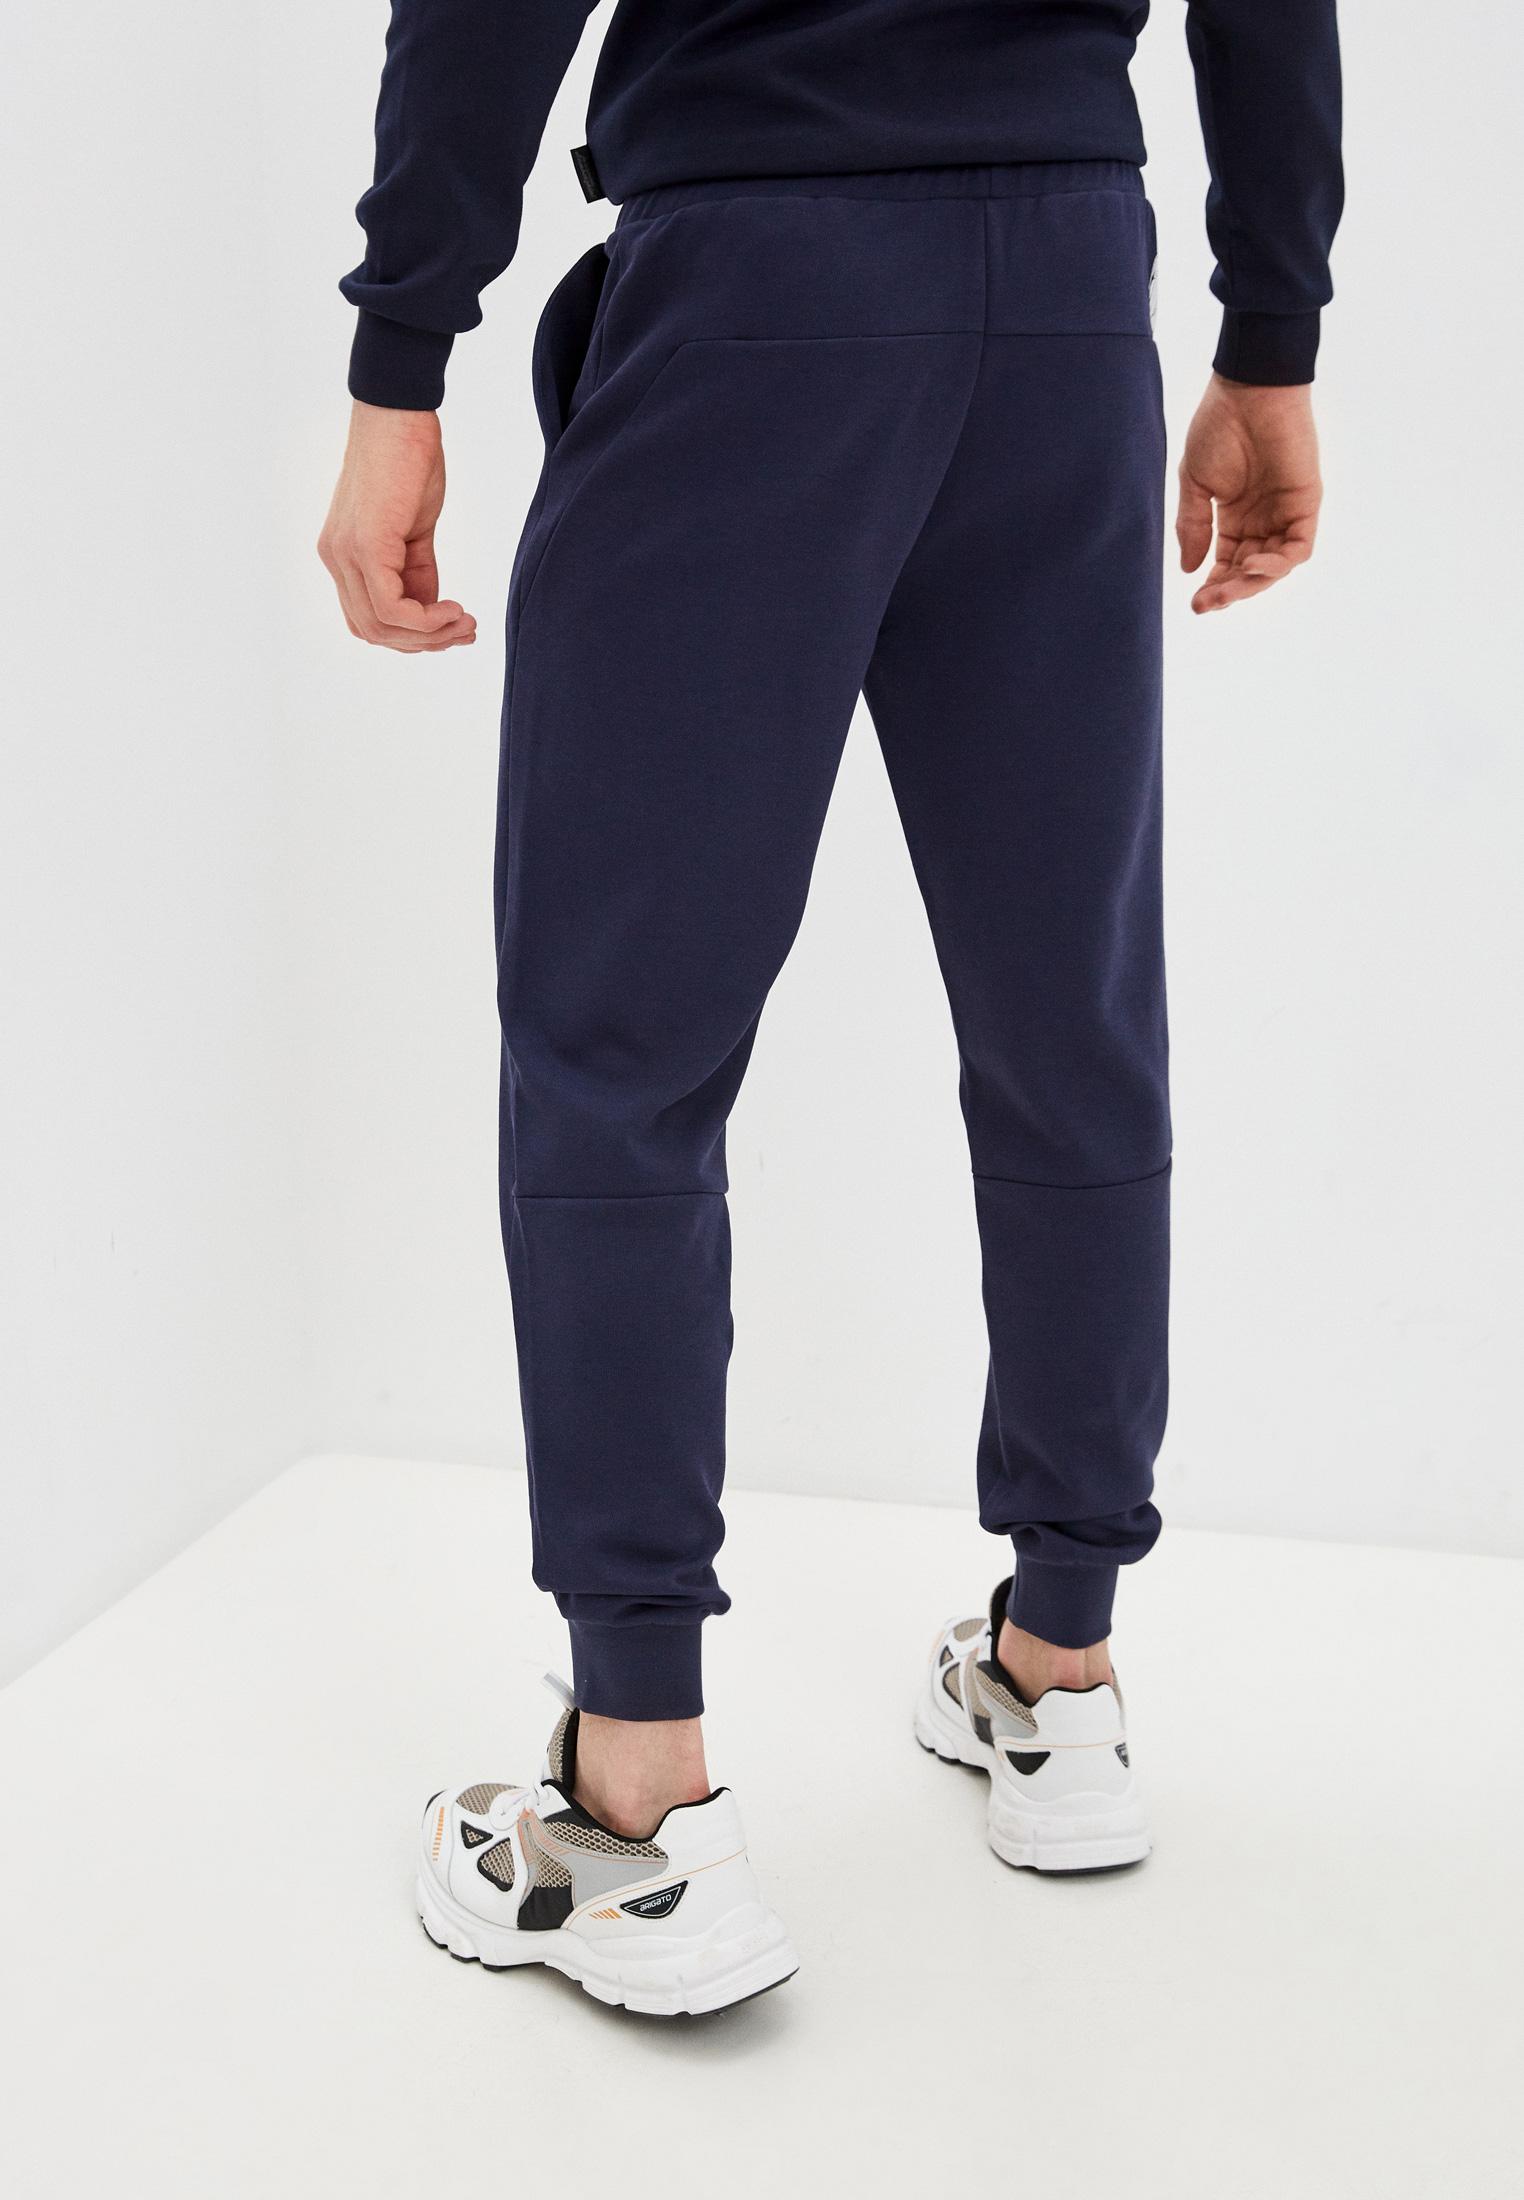 Мужские спортивные брюки Automobili Lamborghini A2XWB1I830435: изображение 4